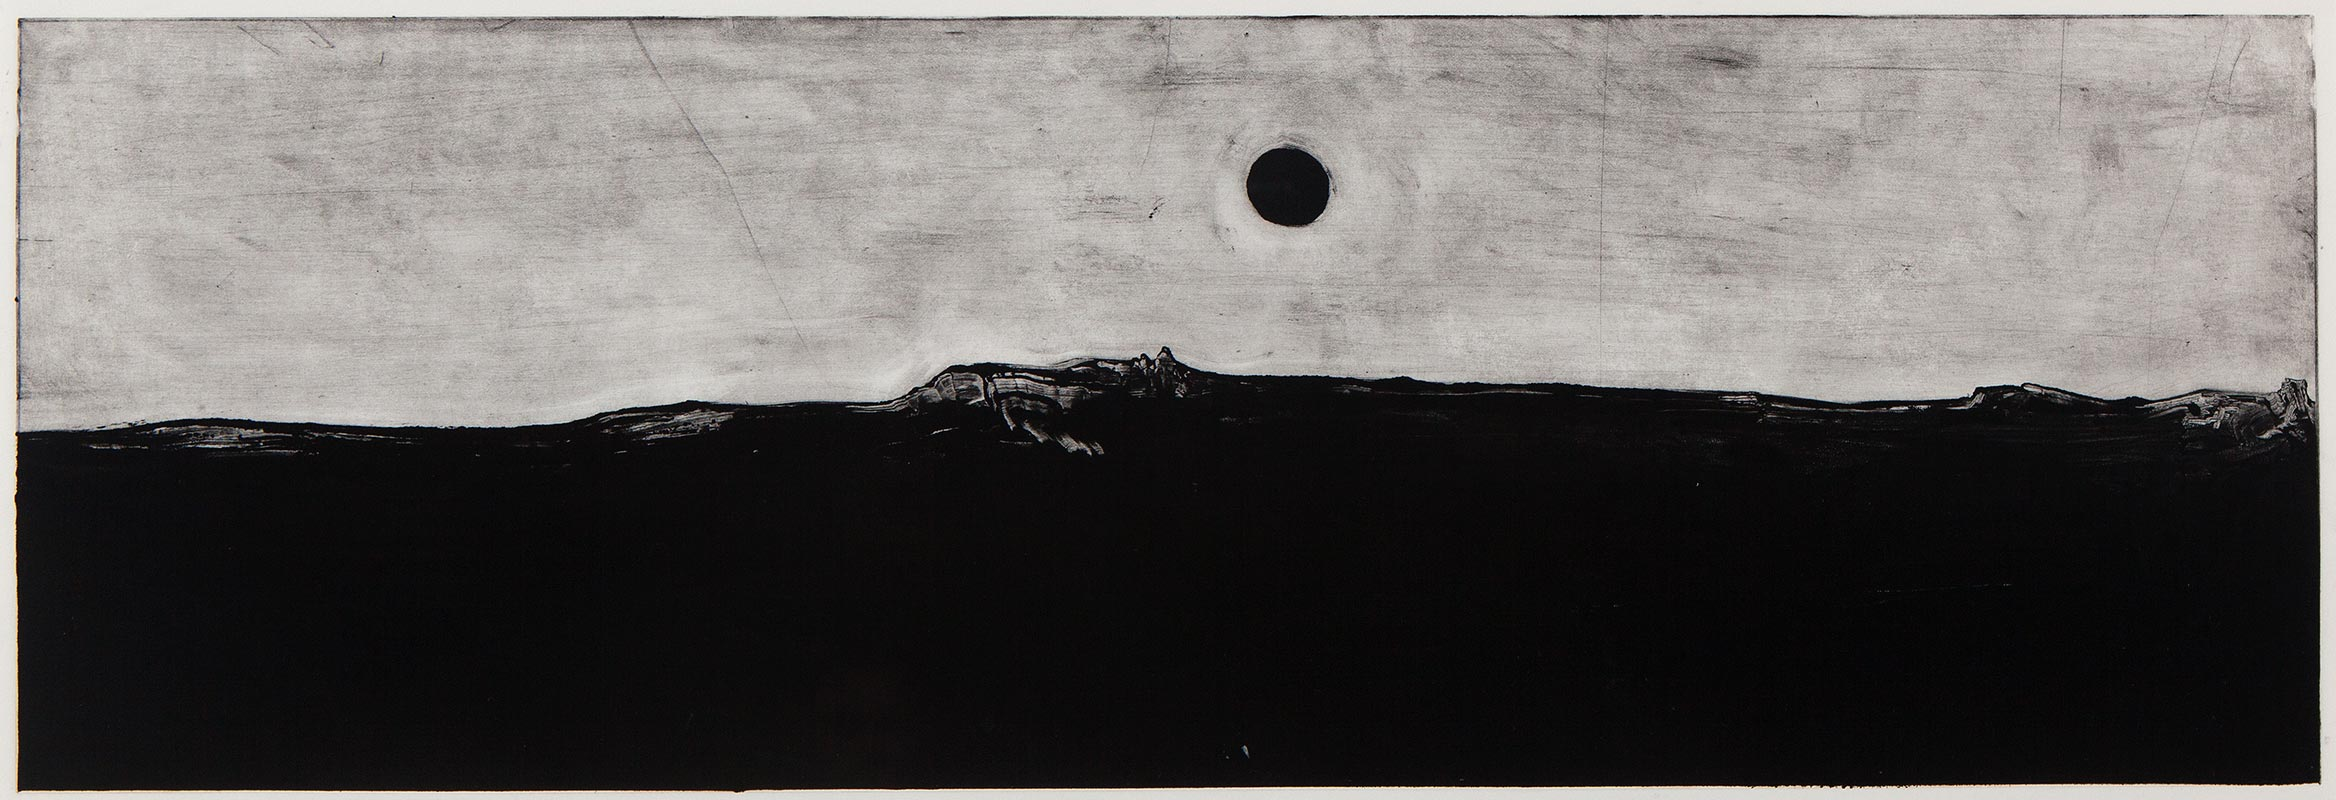 Andrew Tyler - Untitled (Black Sun)